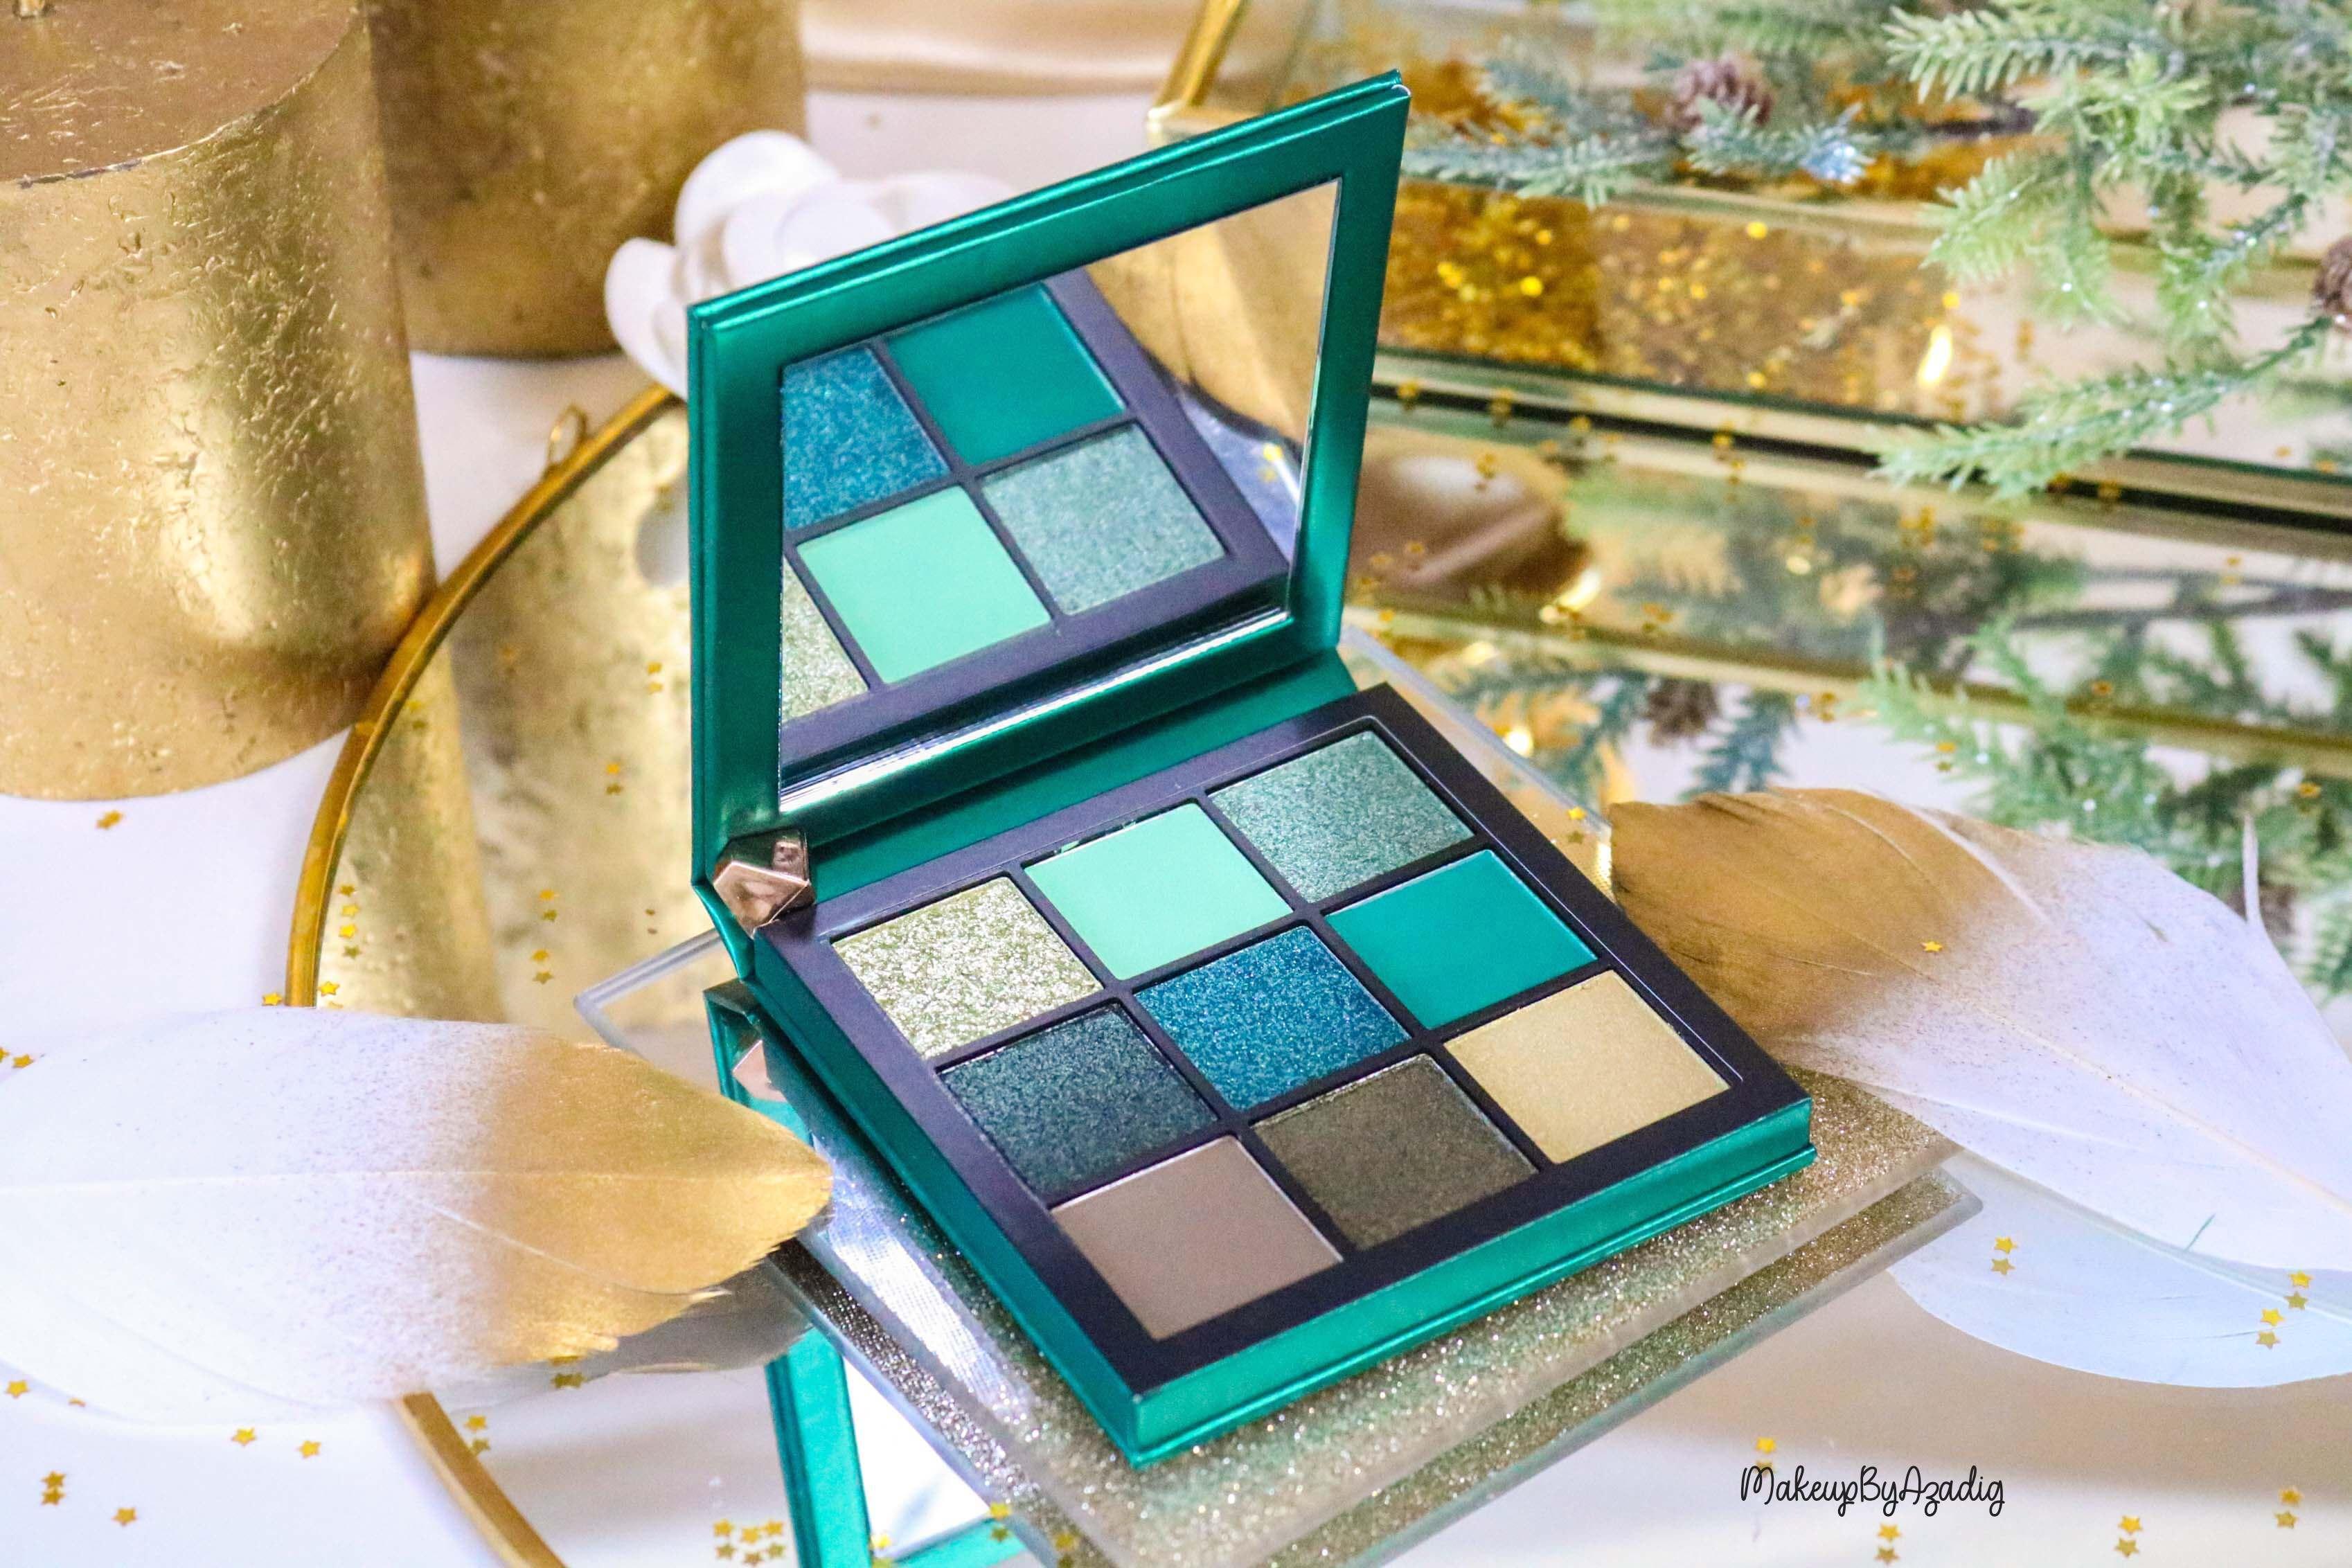 revue-review-palette-emerald-obsessions-huda-beauty-topaz-sapphire-avis-prix-swatch-makeupbyazadig-meilleure-miniature